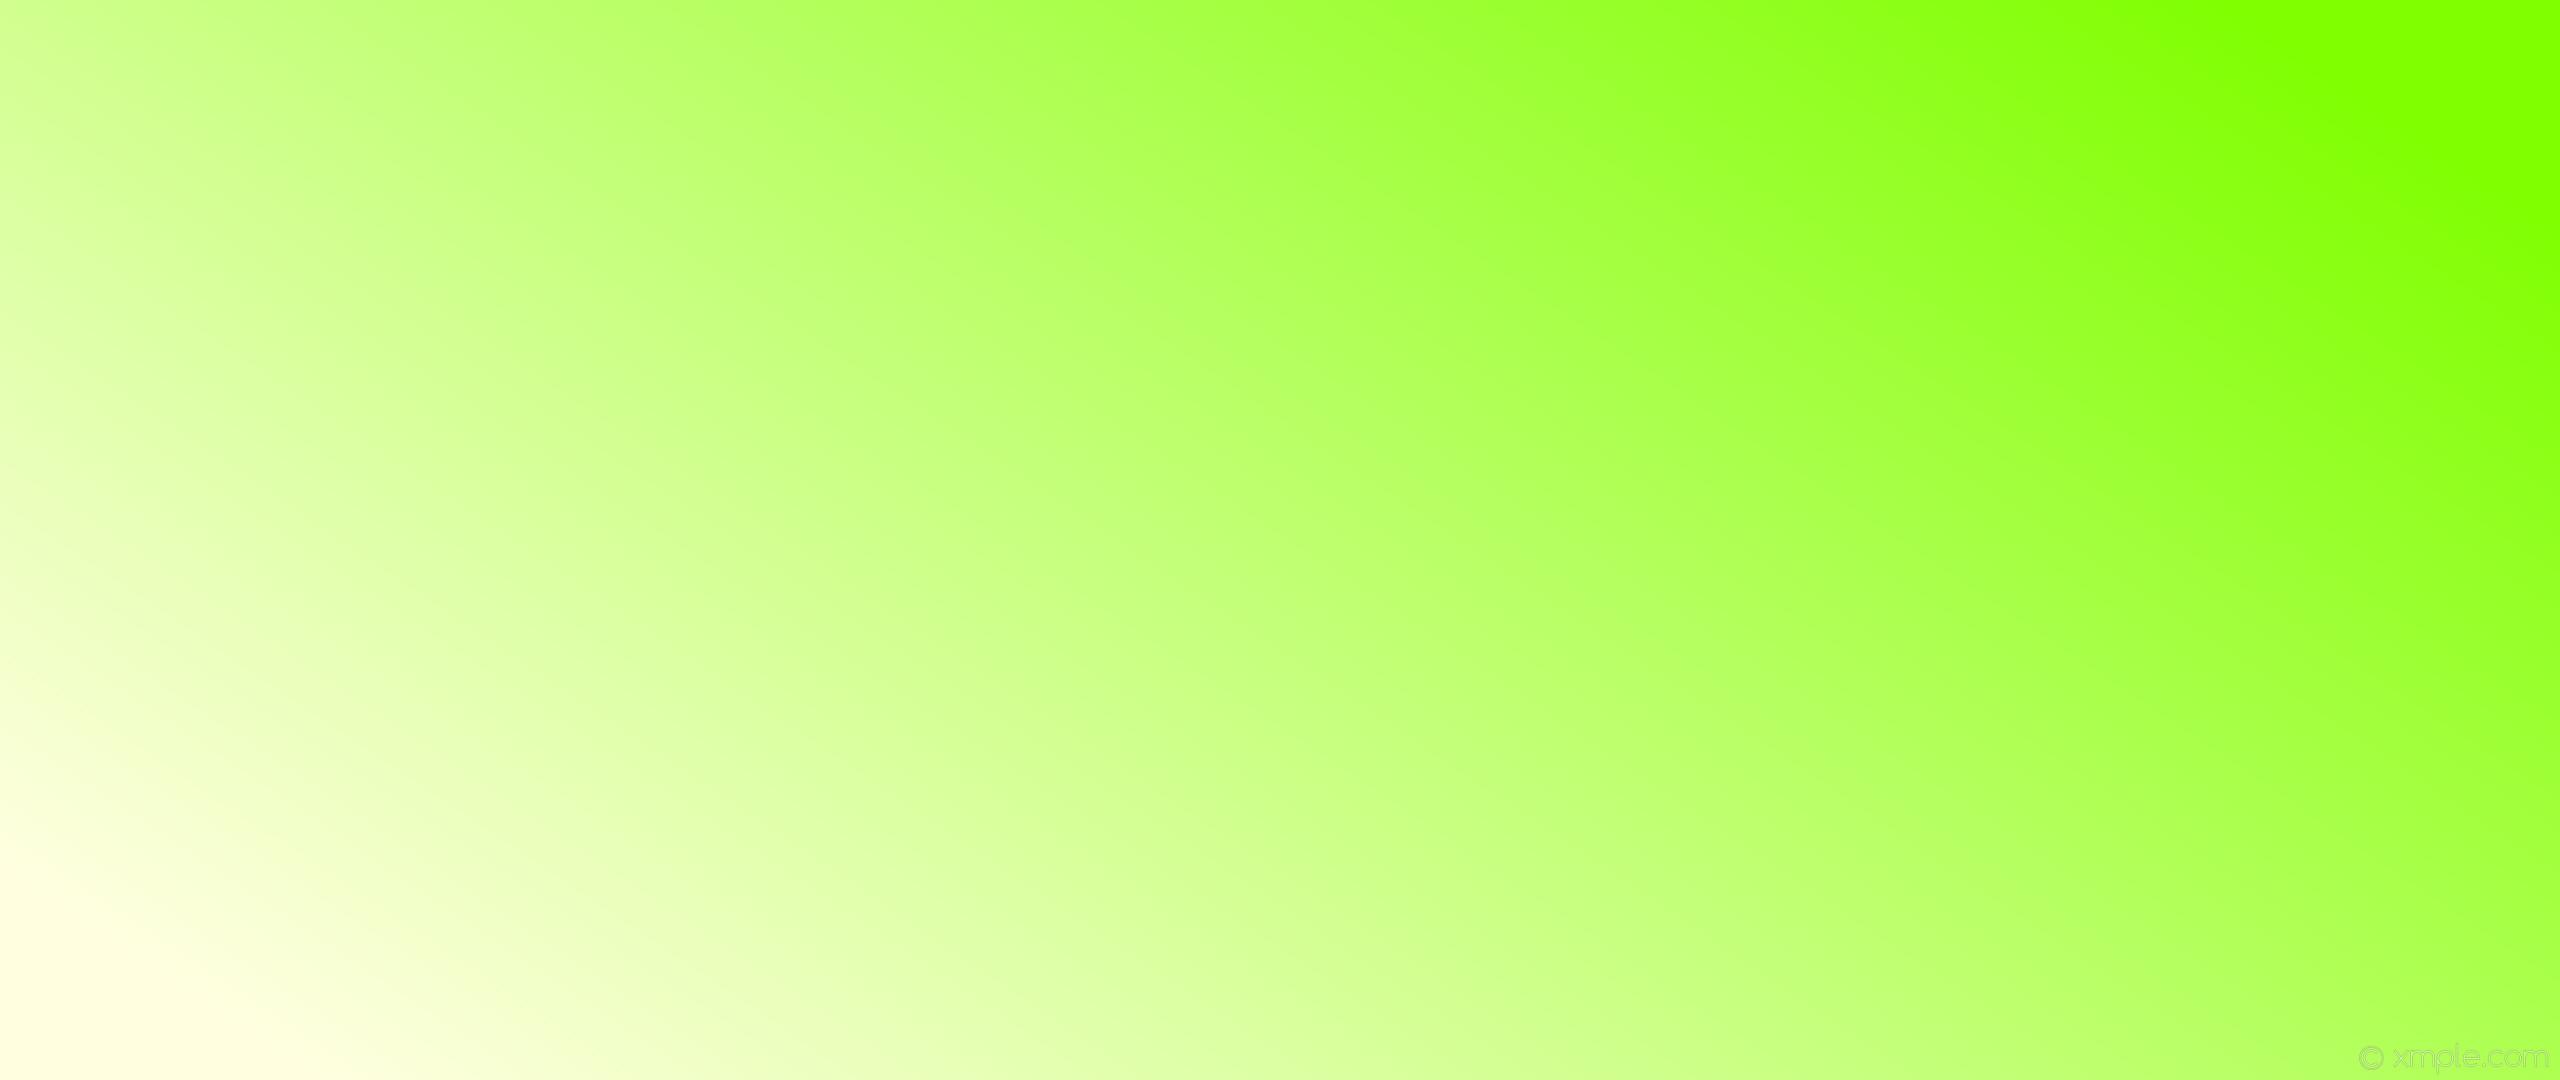 fabulous wallpaper green yellow gradient linear light yellow chartreuse  ffffe fff with orange and green wallpaper